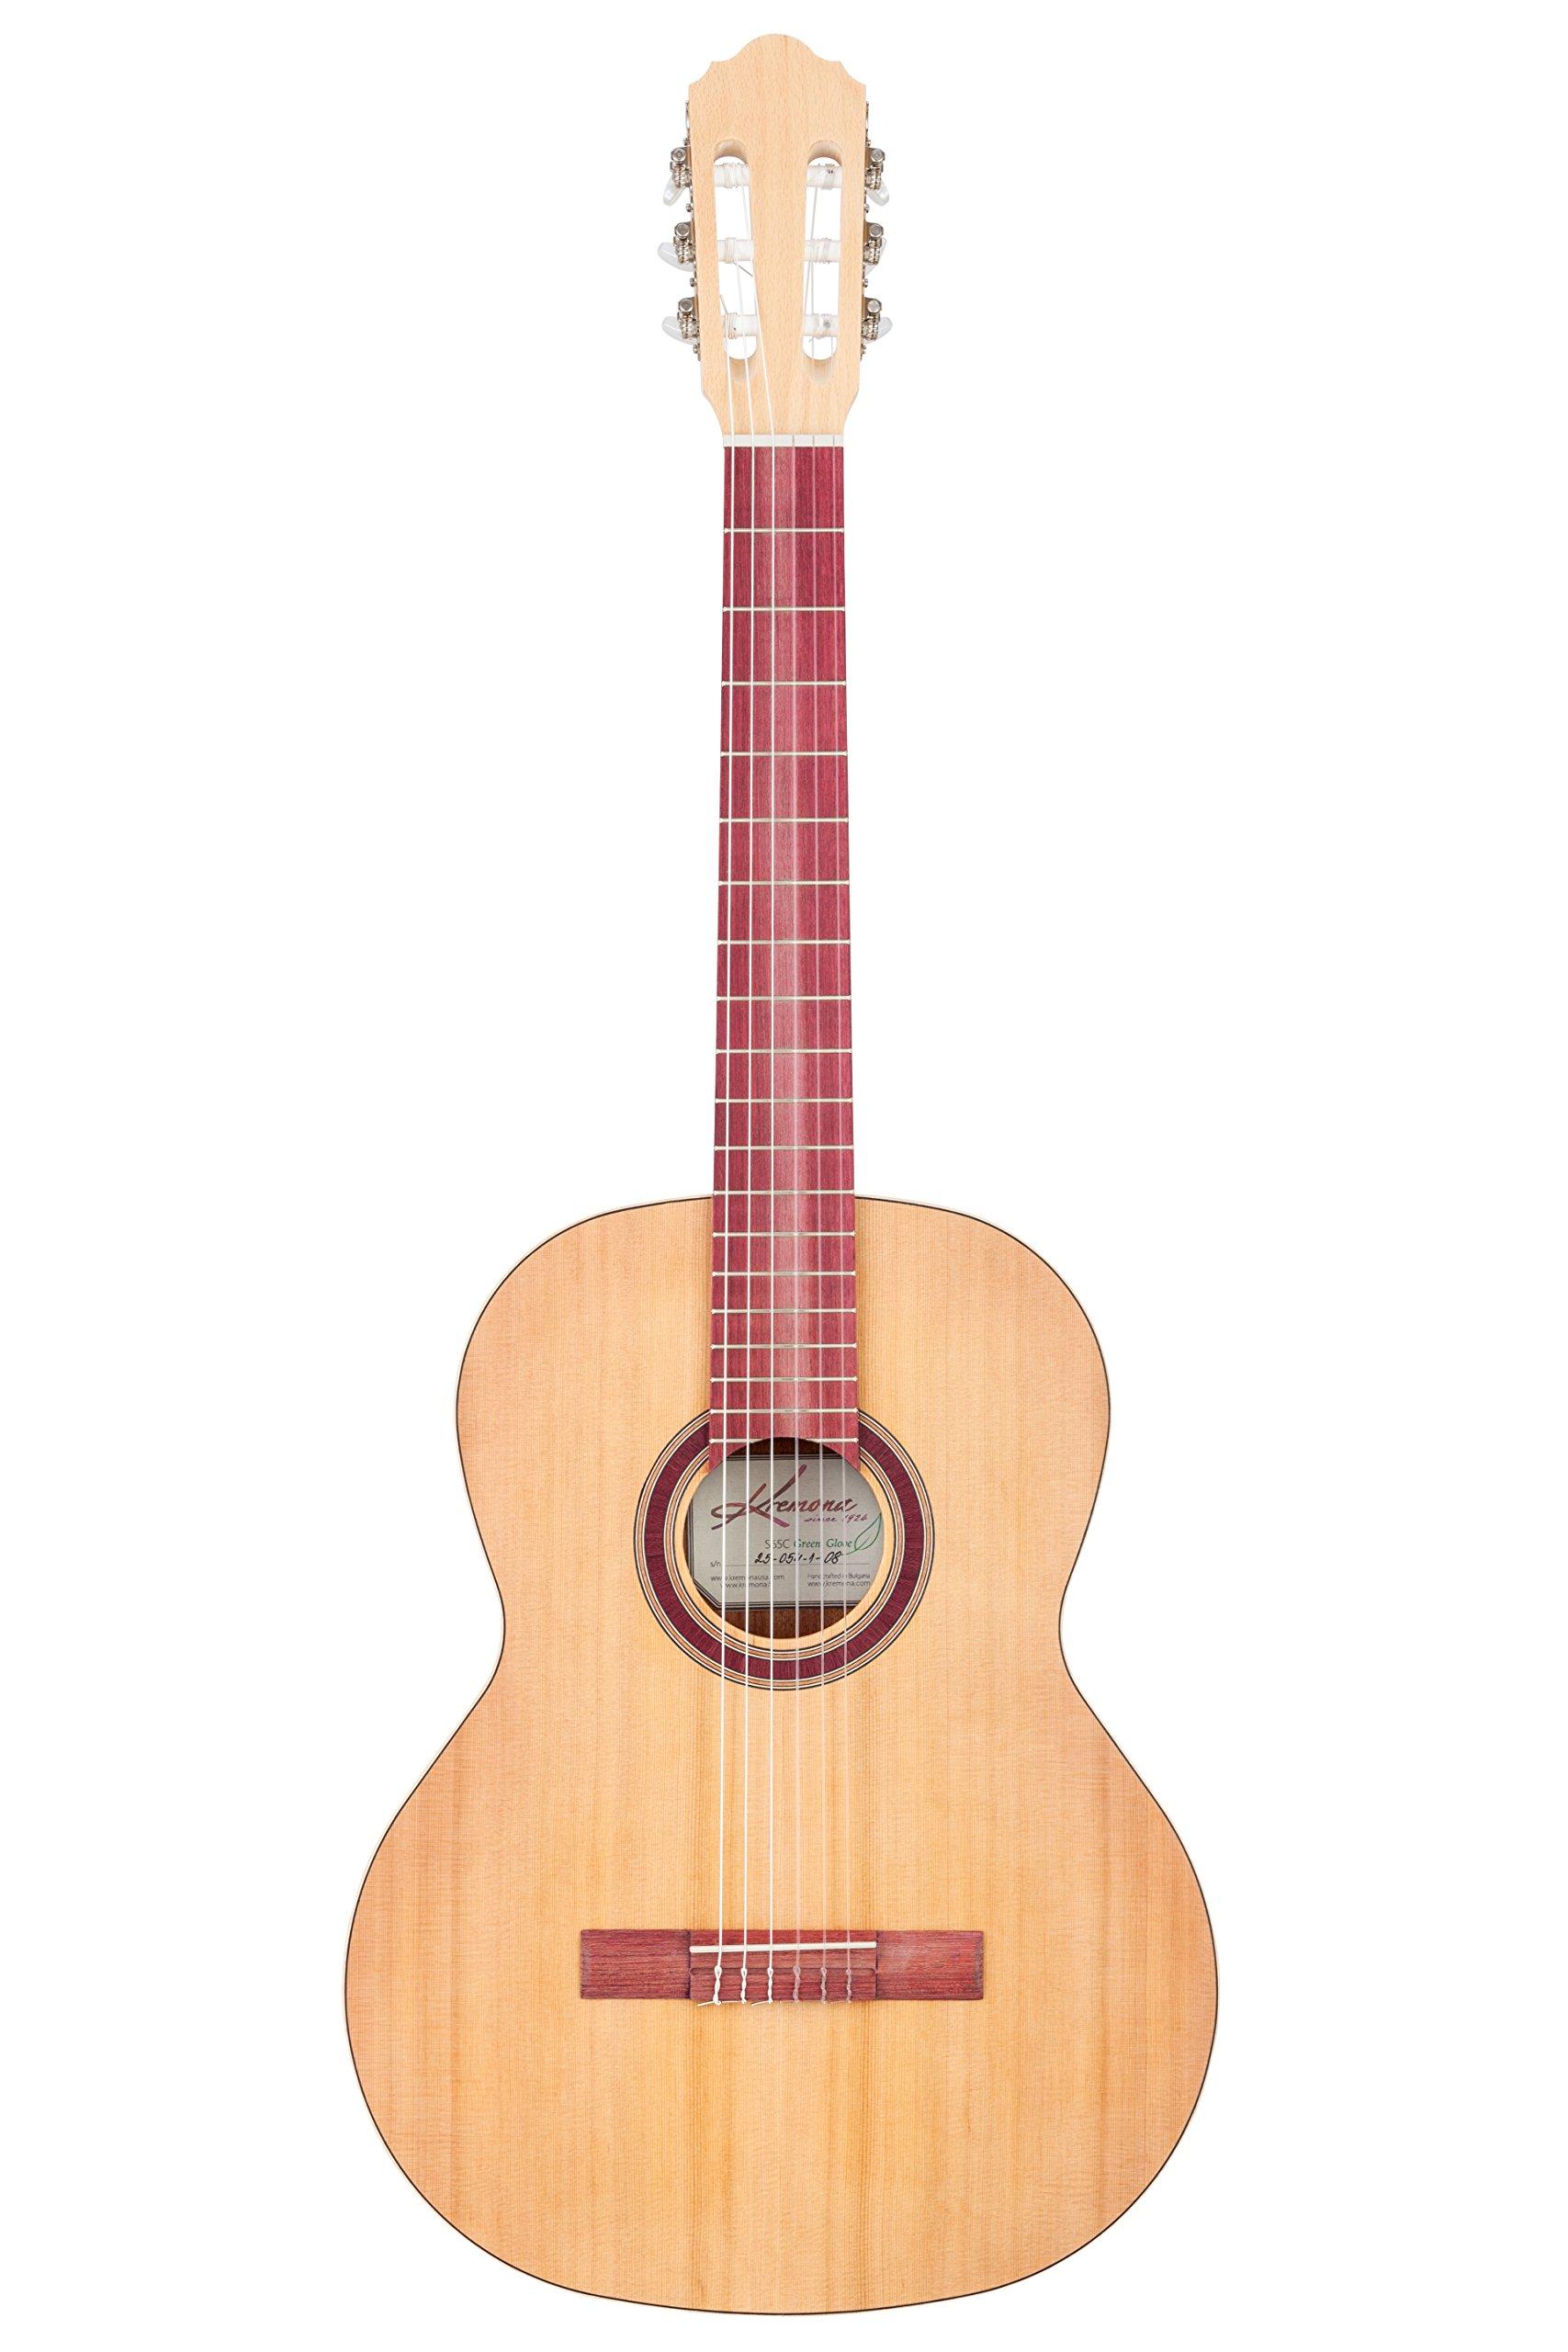 Kremona 6 String Classical Guitar S65C GG